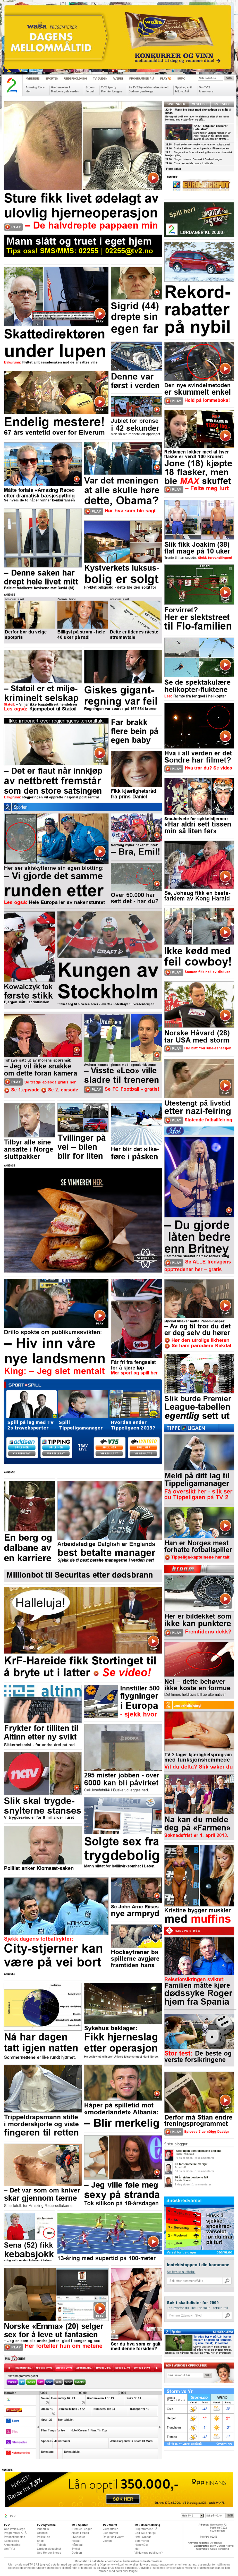 TV 2 (Norway) at Wednesday March 20, 2013, 10:27 p.m. UTC